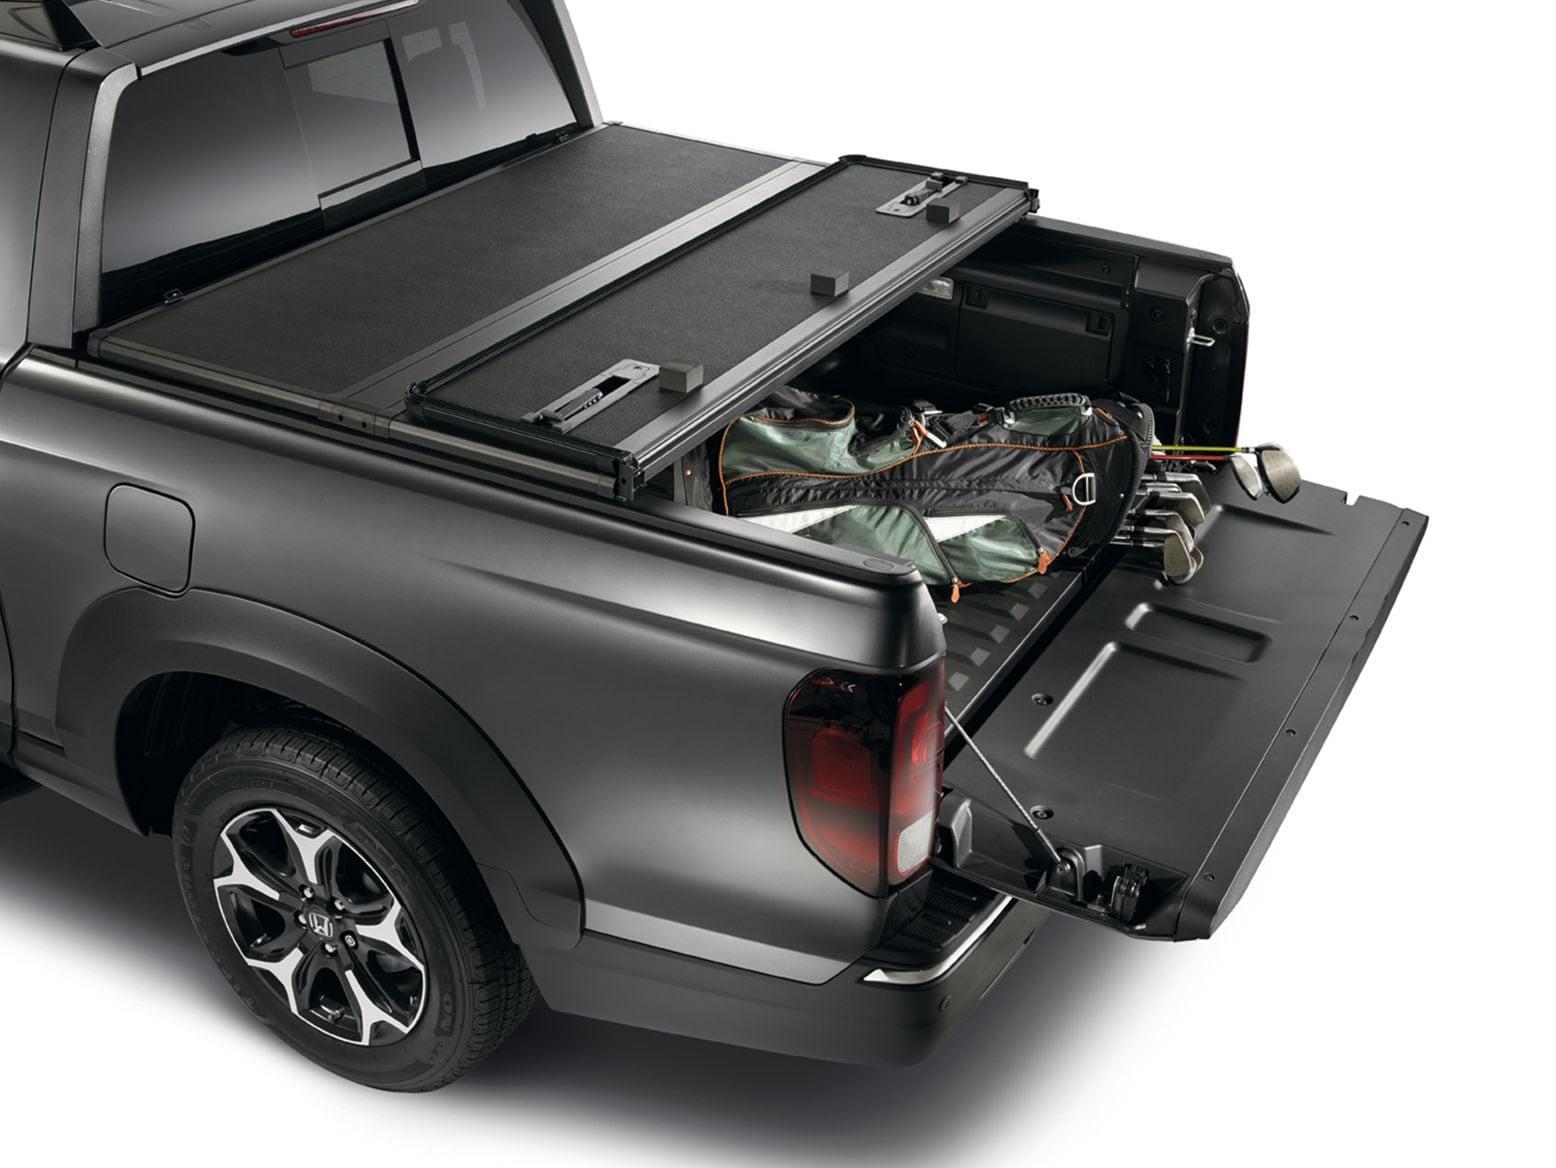 Image Result For Honda Ridgeline Hard Tonneau Cover